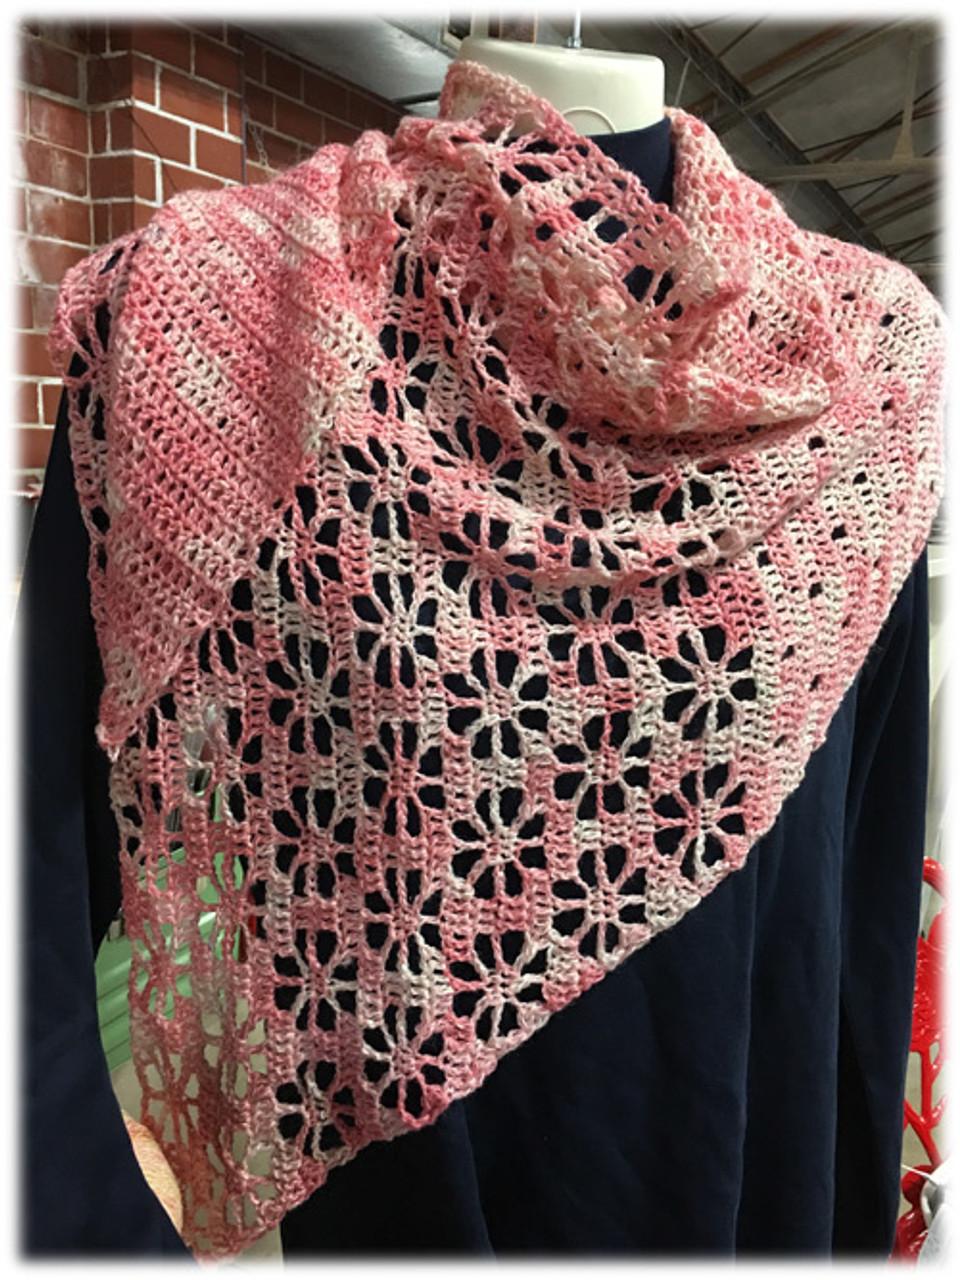 Mirasol Yarn - Kancha - lambswool and cotton blend - Angelika's Yarn Store